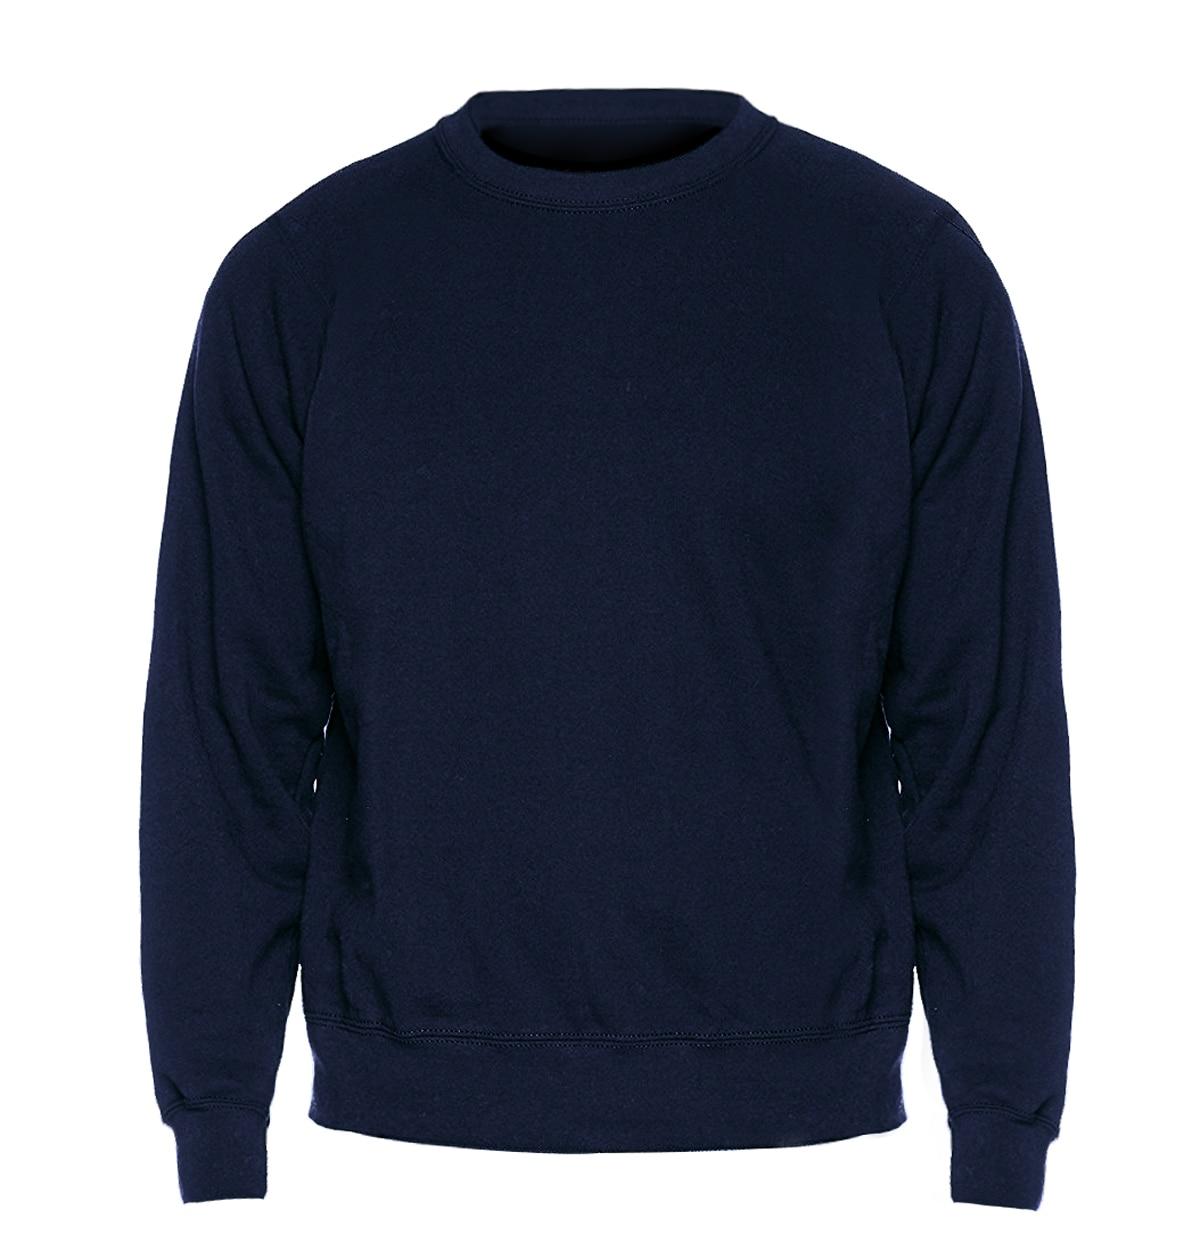 Solid color Sweatshirt Men Hoodie Crewneck Sweatshirts Winter Autumn Fleece Hoody Casual Gray Blue Red Black White Streetwear 3